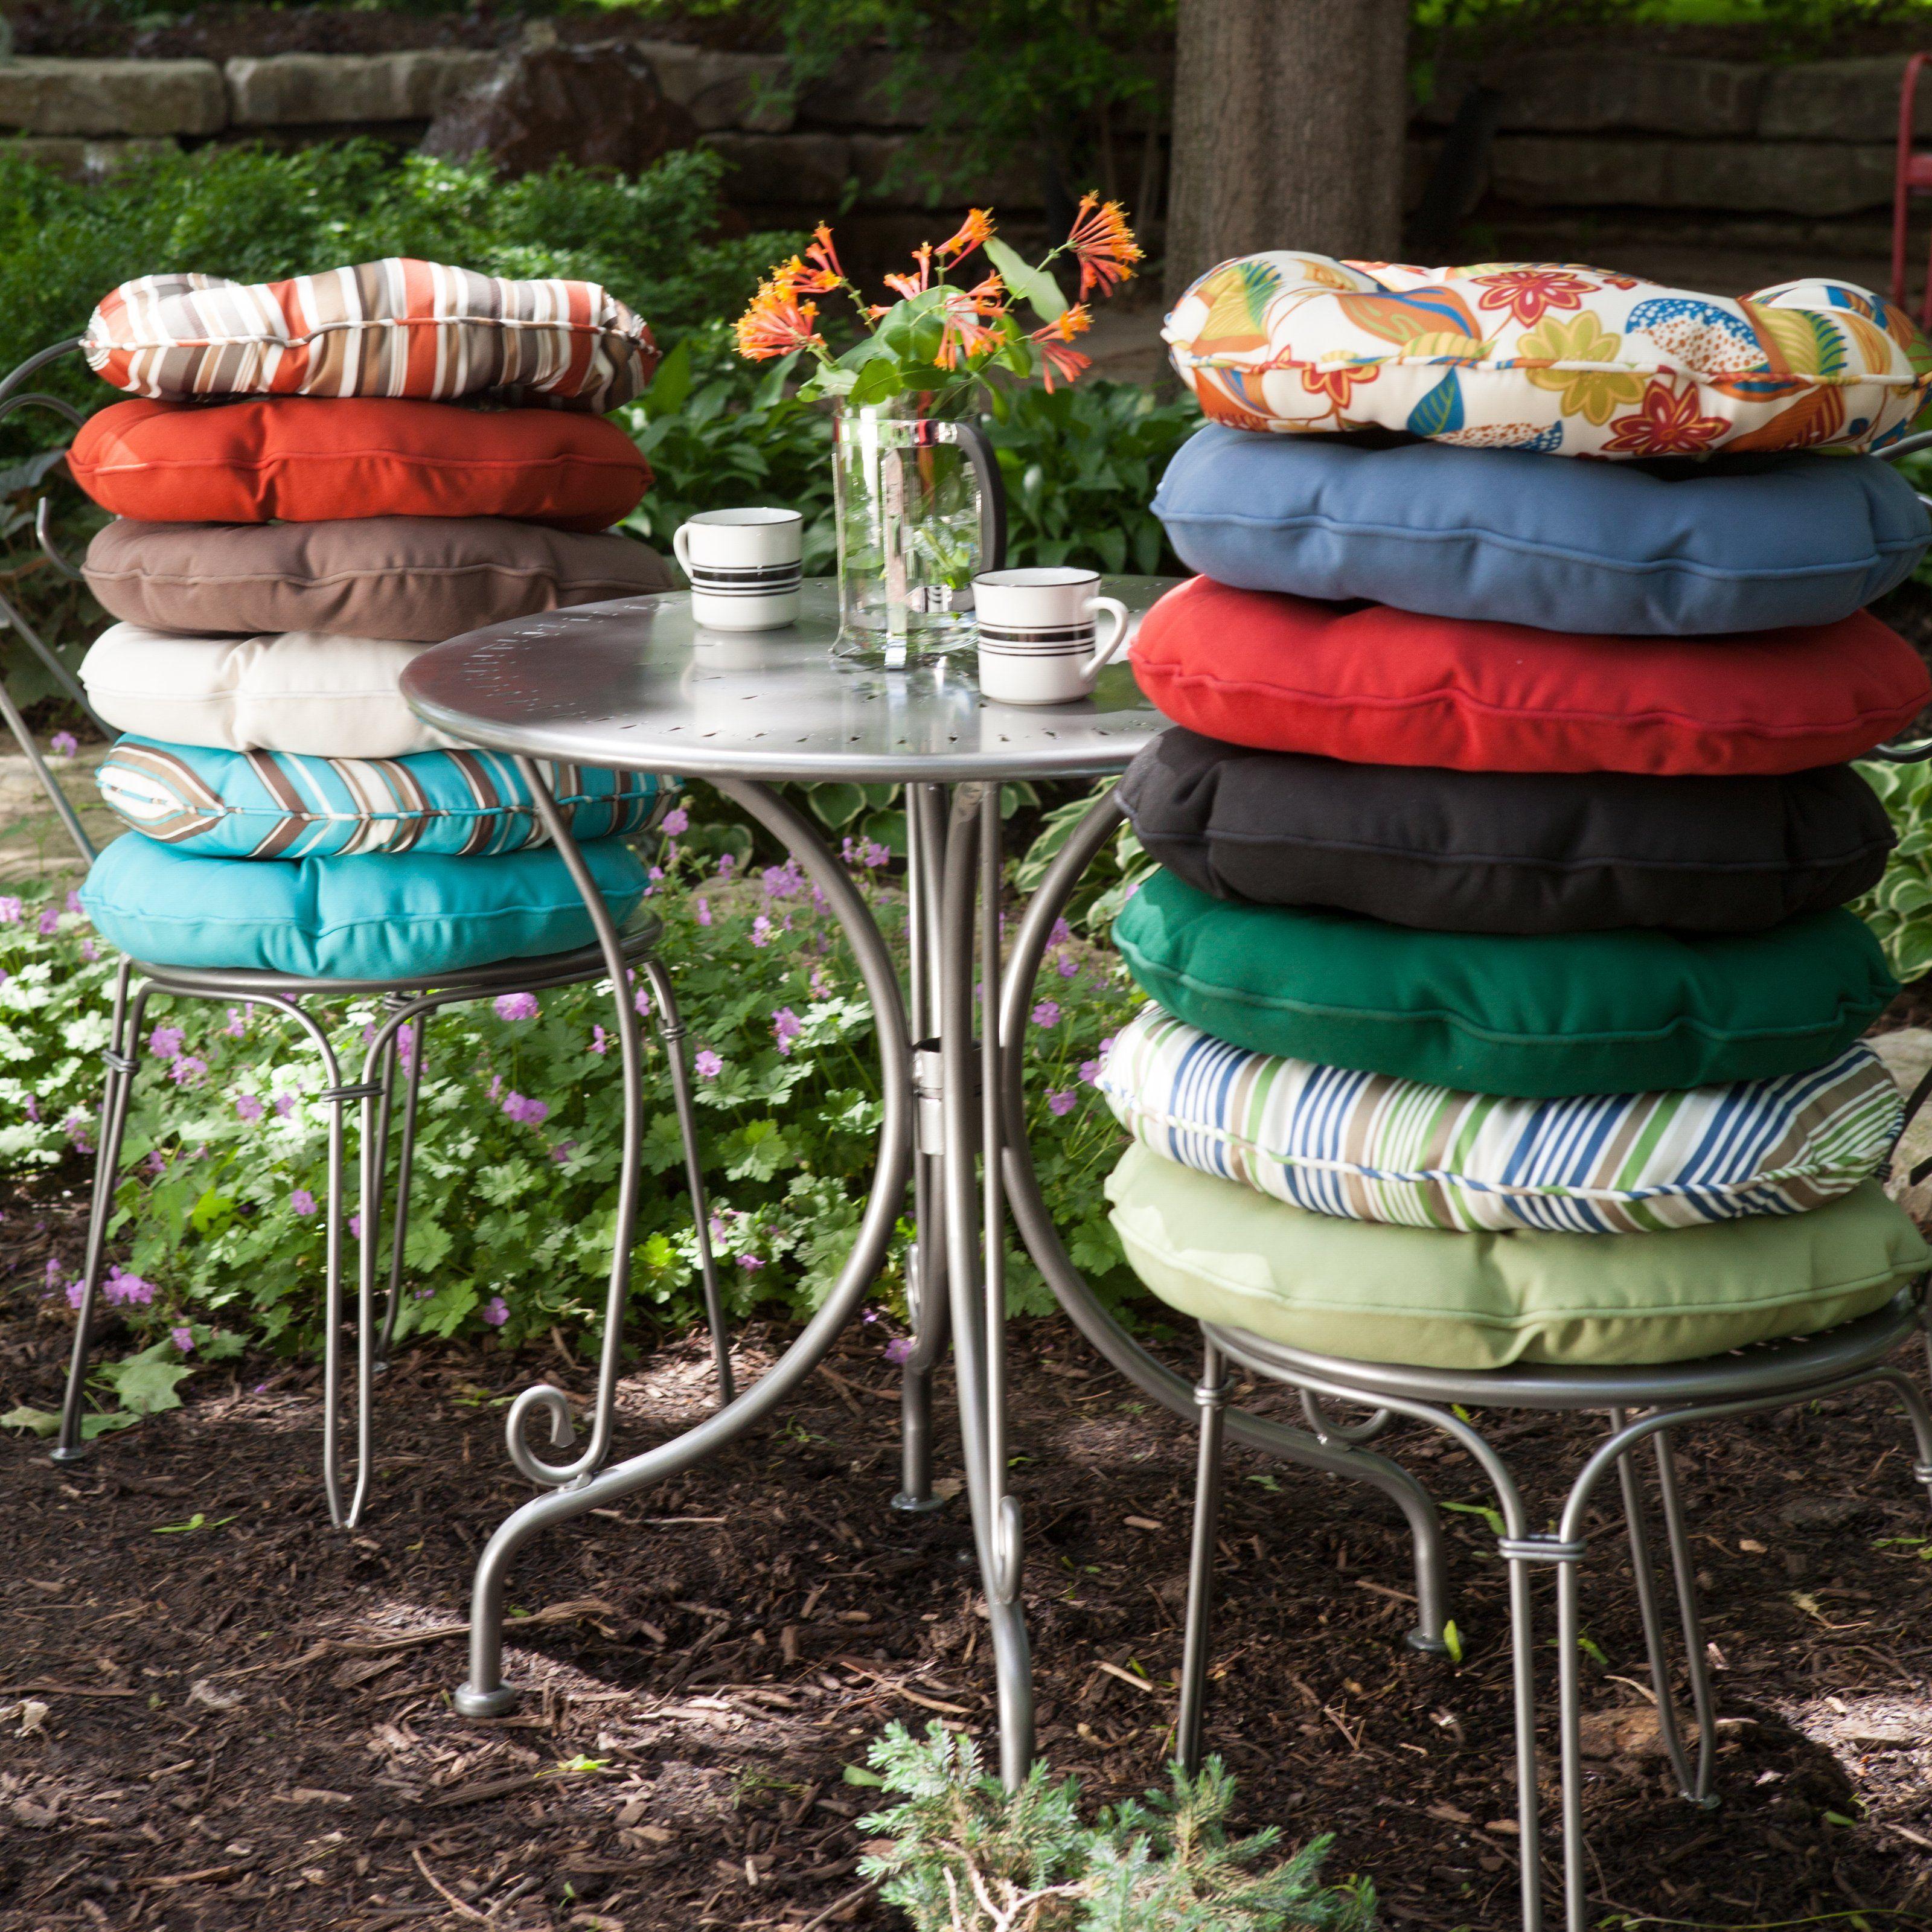 Coral Coast Bistro Outdoor Round Seat Cushion   18 Diameter In.   Set Of 2    Bistro Chair Cushions At Hayneedle | Back Yard | Pinterest | Round Seat  ...